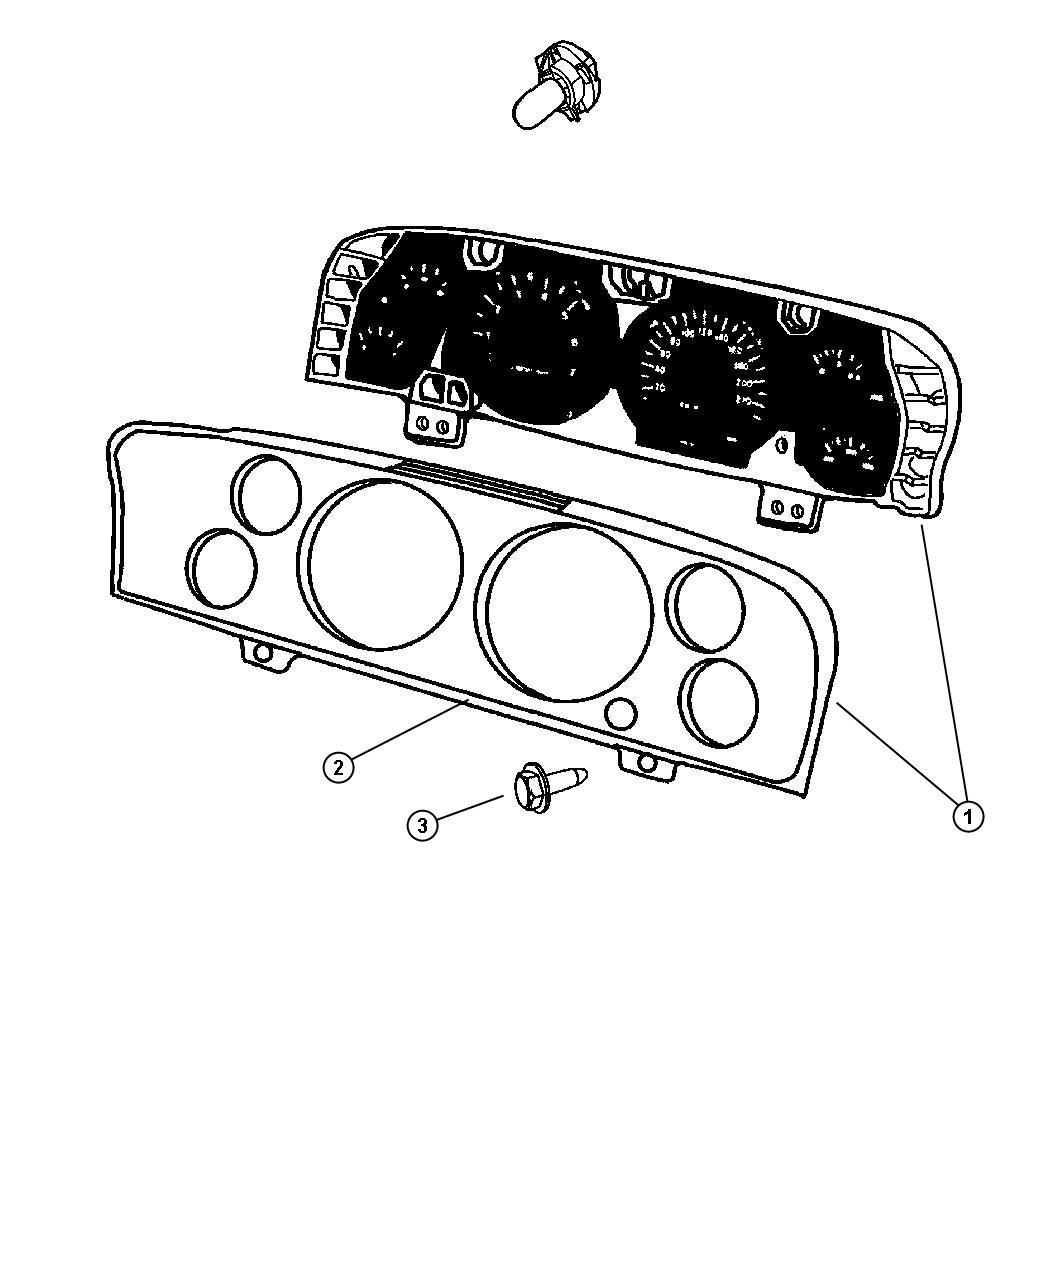 2009 Dodge Ram 2500 Cluster  Instrument Panel   Jay  Jcb